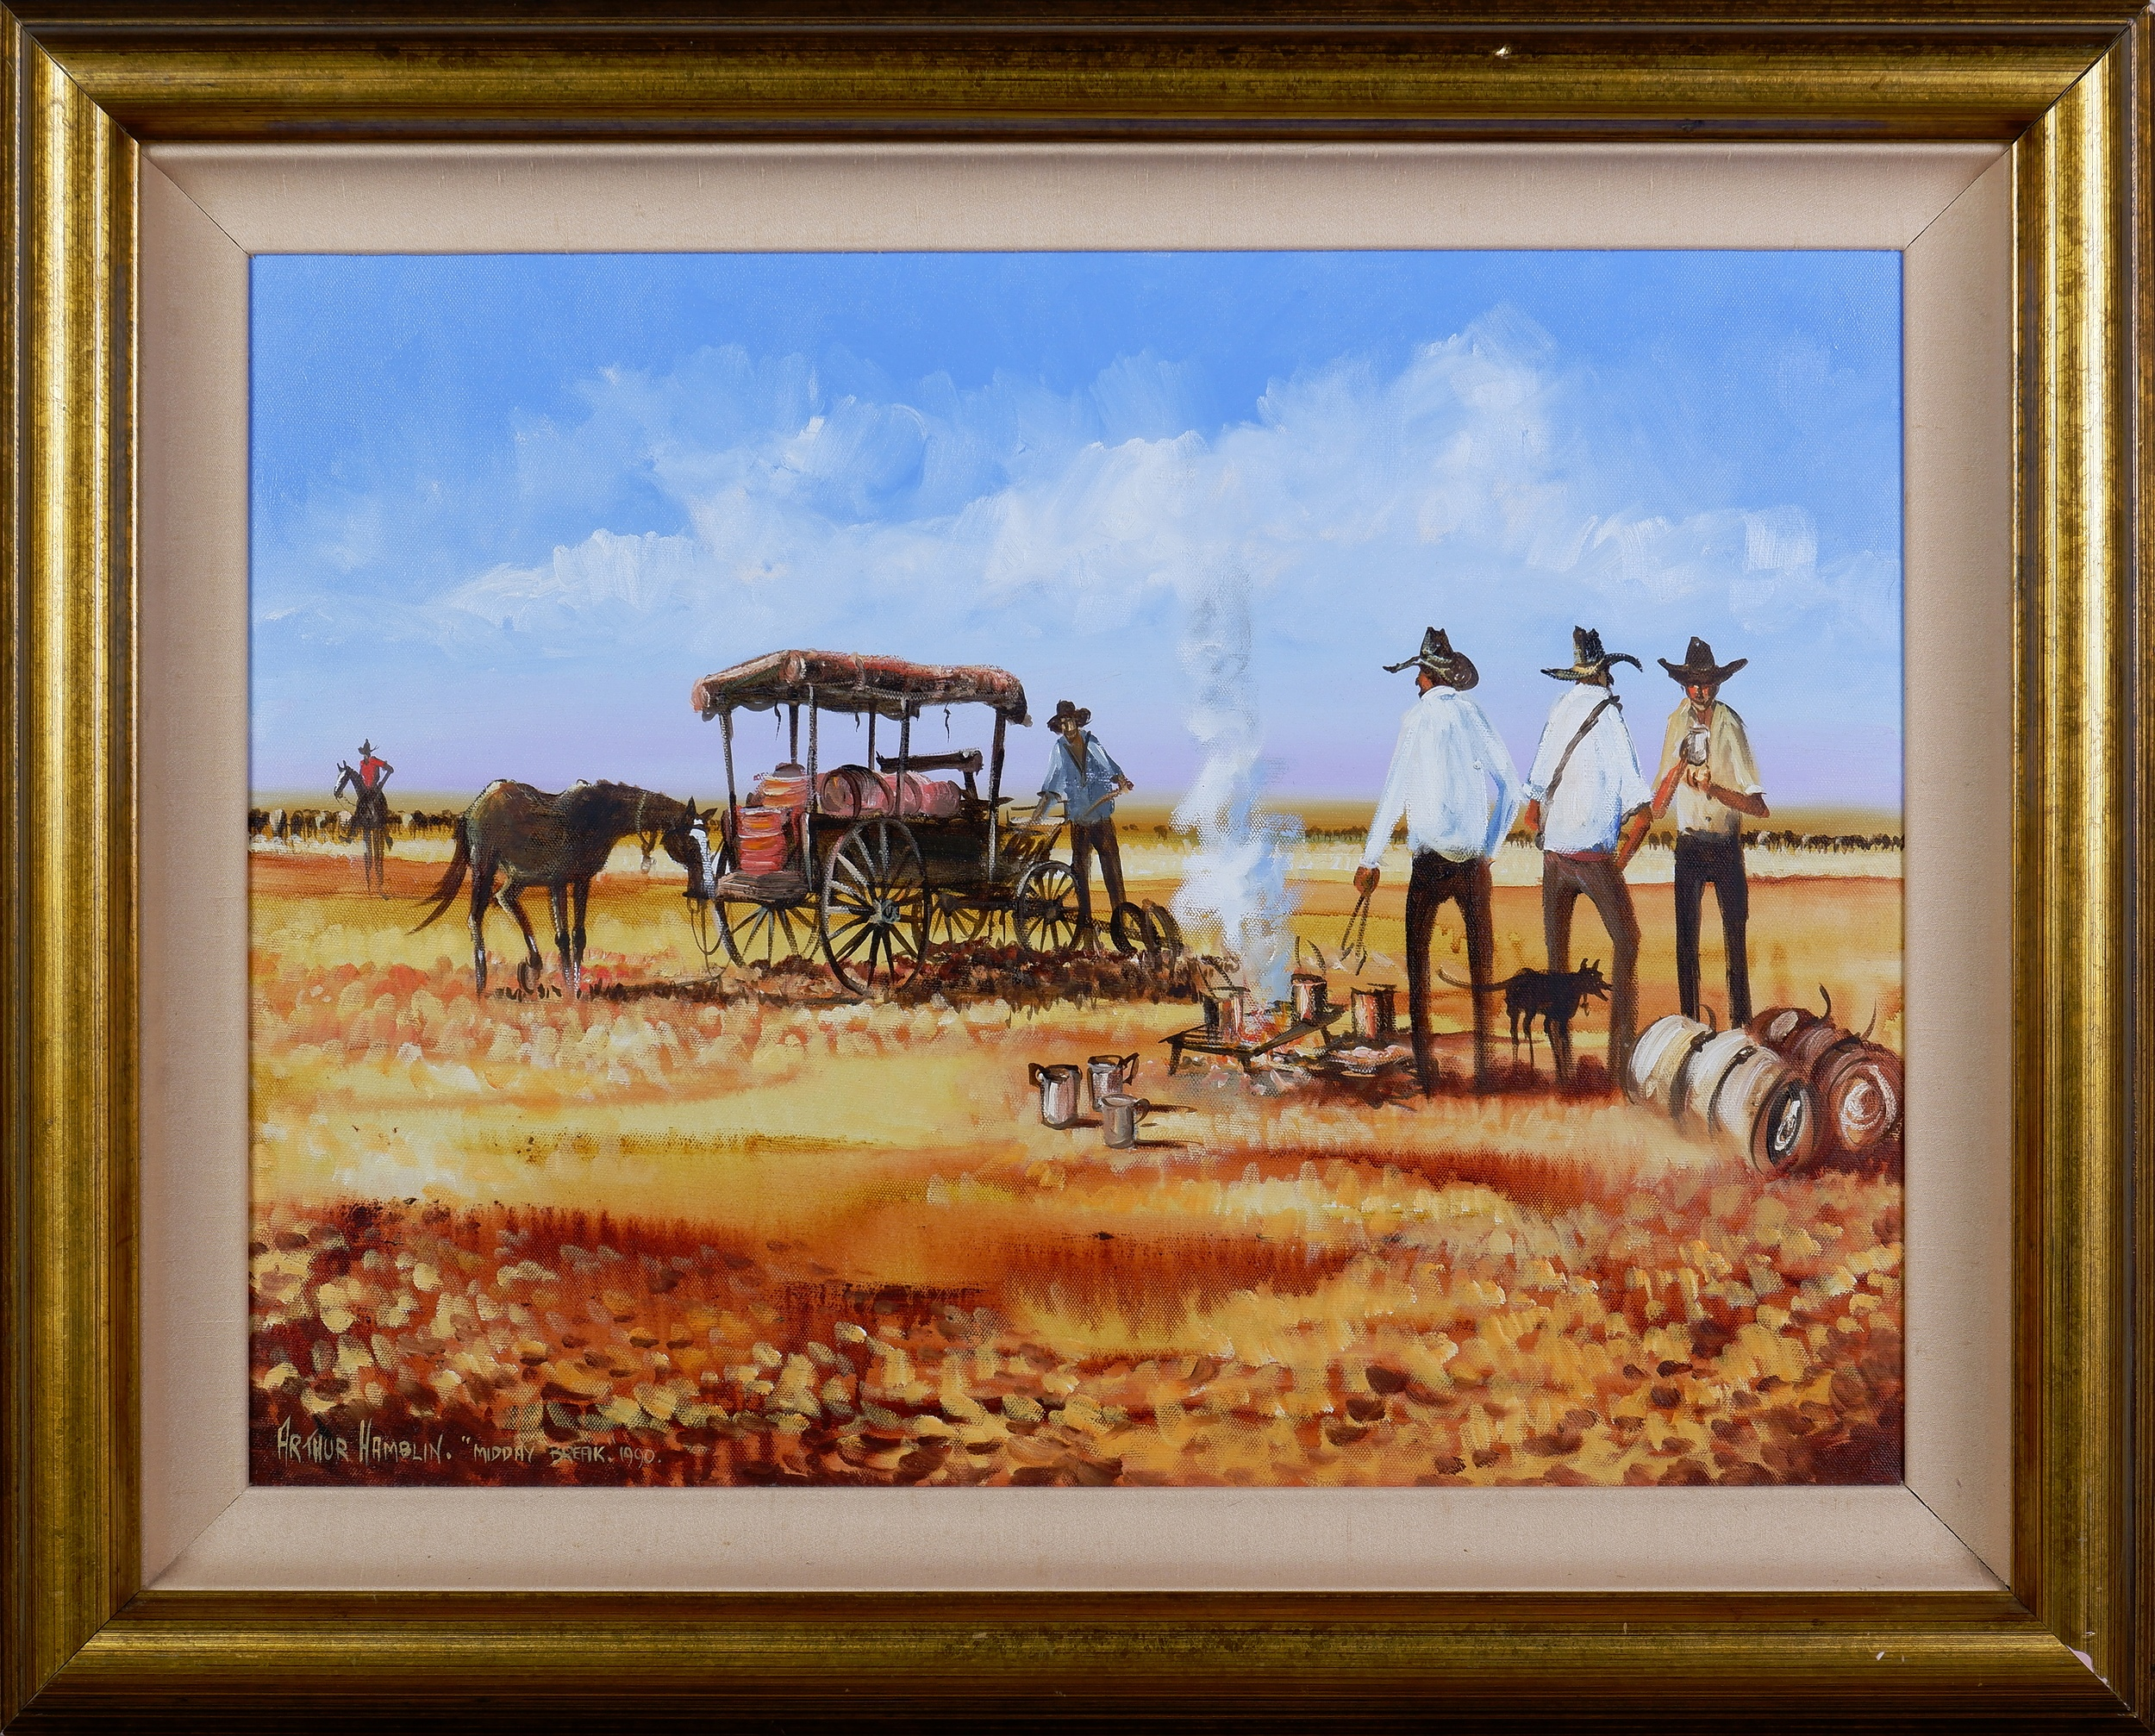 'Arthur Hamblin (born 1933), Midday Break 1990, Oil on Canvas'